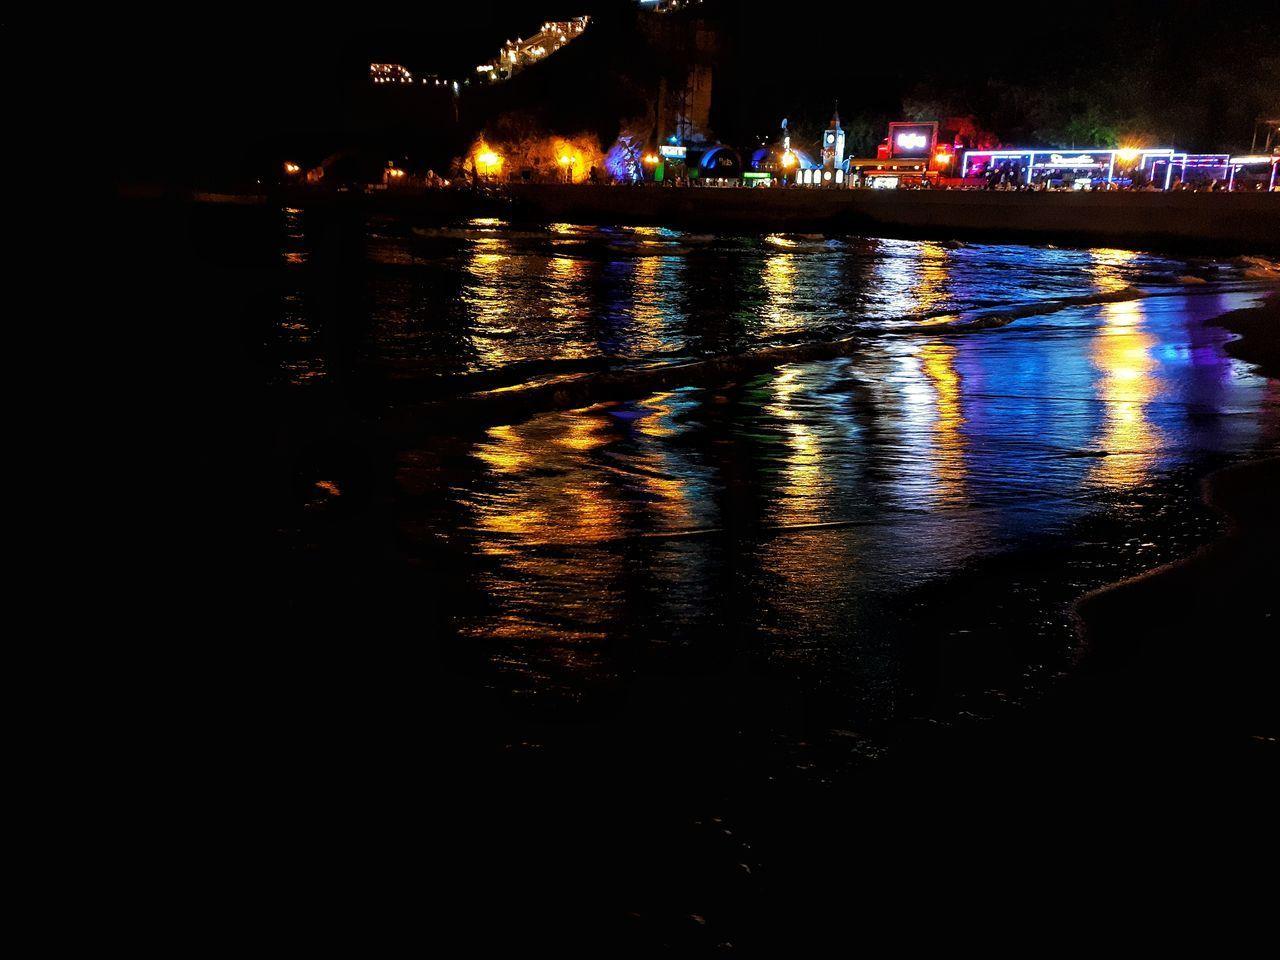 RIVER BY ILLUMINATED CITY AT NIGHT